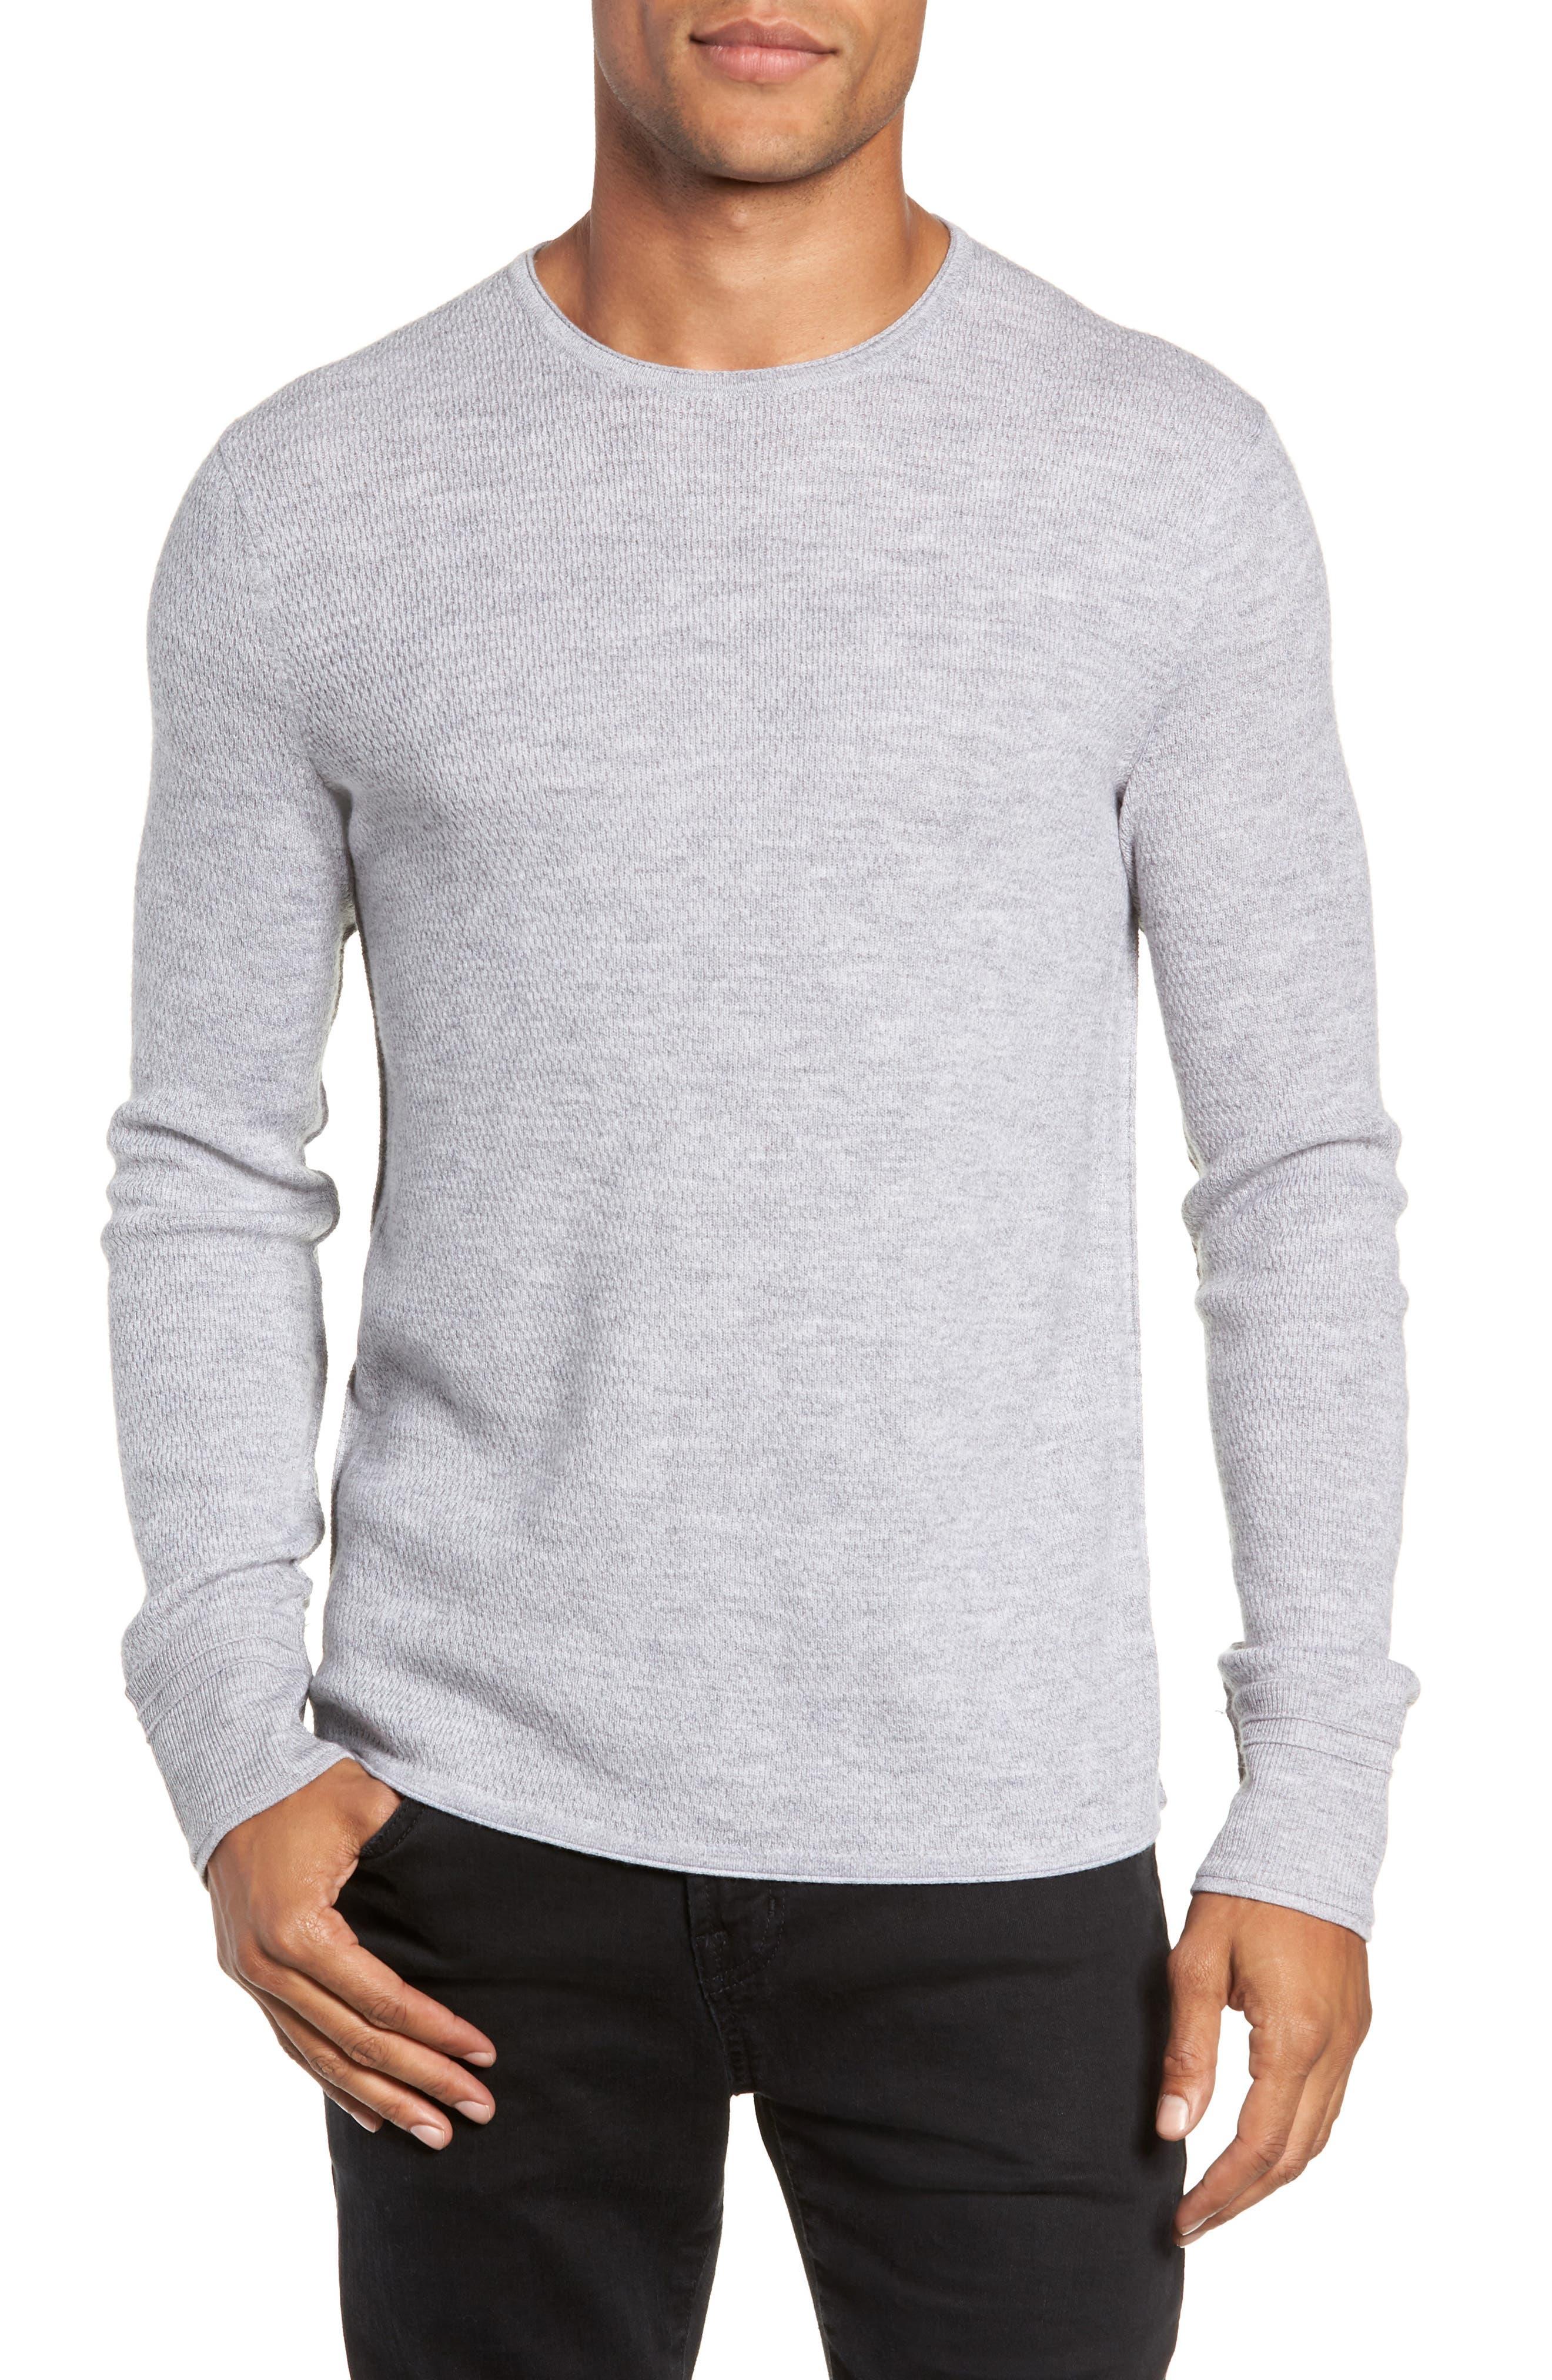 Gregory Merino Wool Blend Crewneck Sweater,                             Main thumbnail 1, color,                             GREY